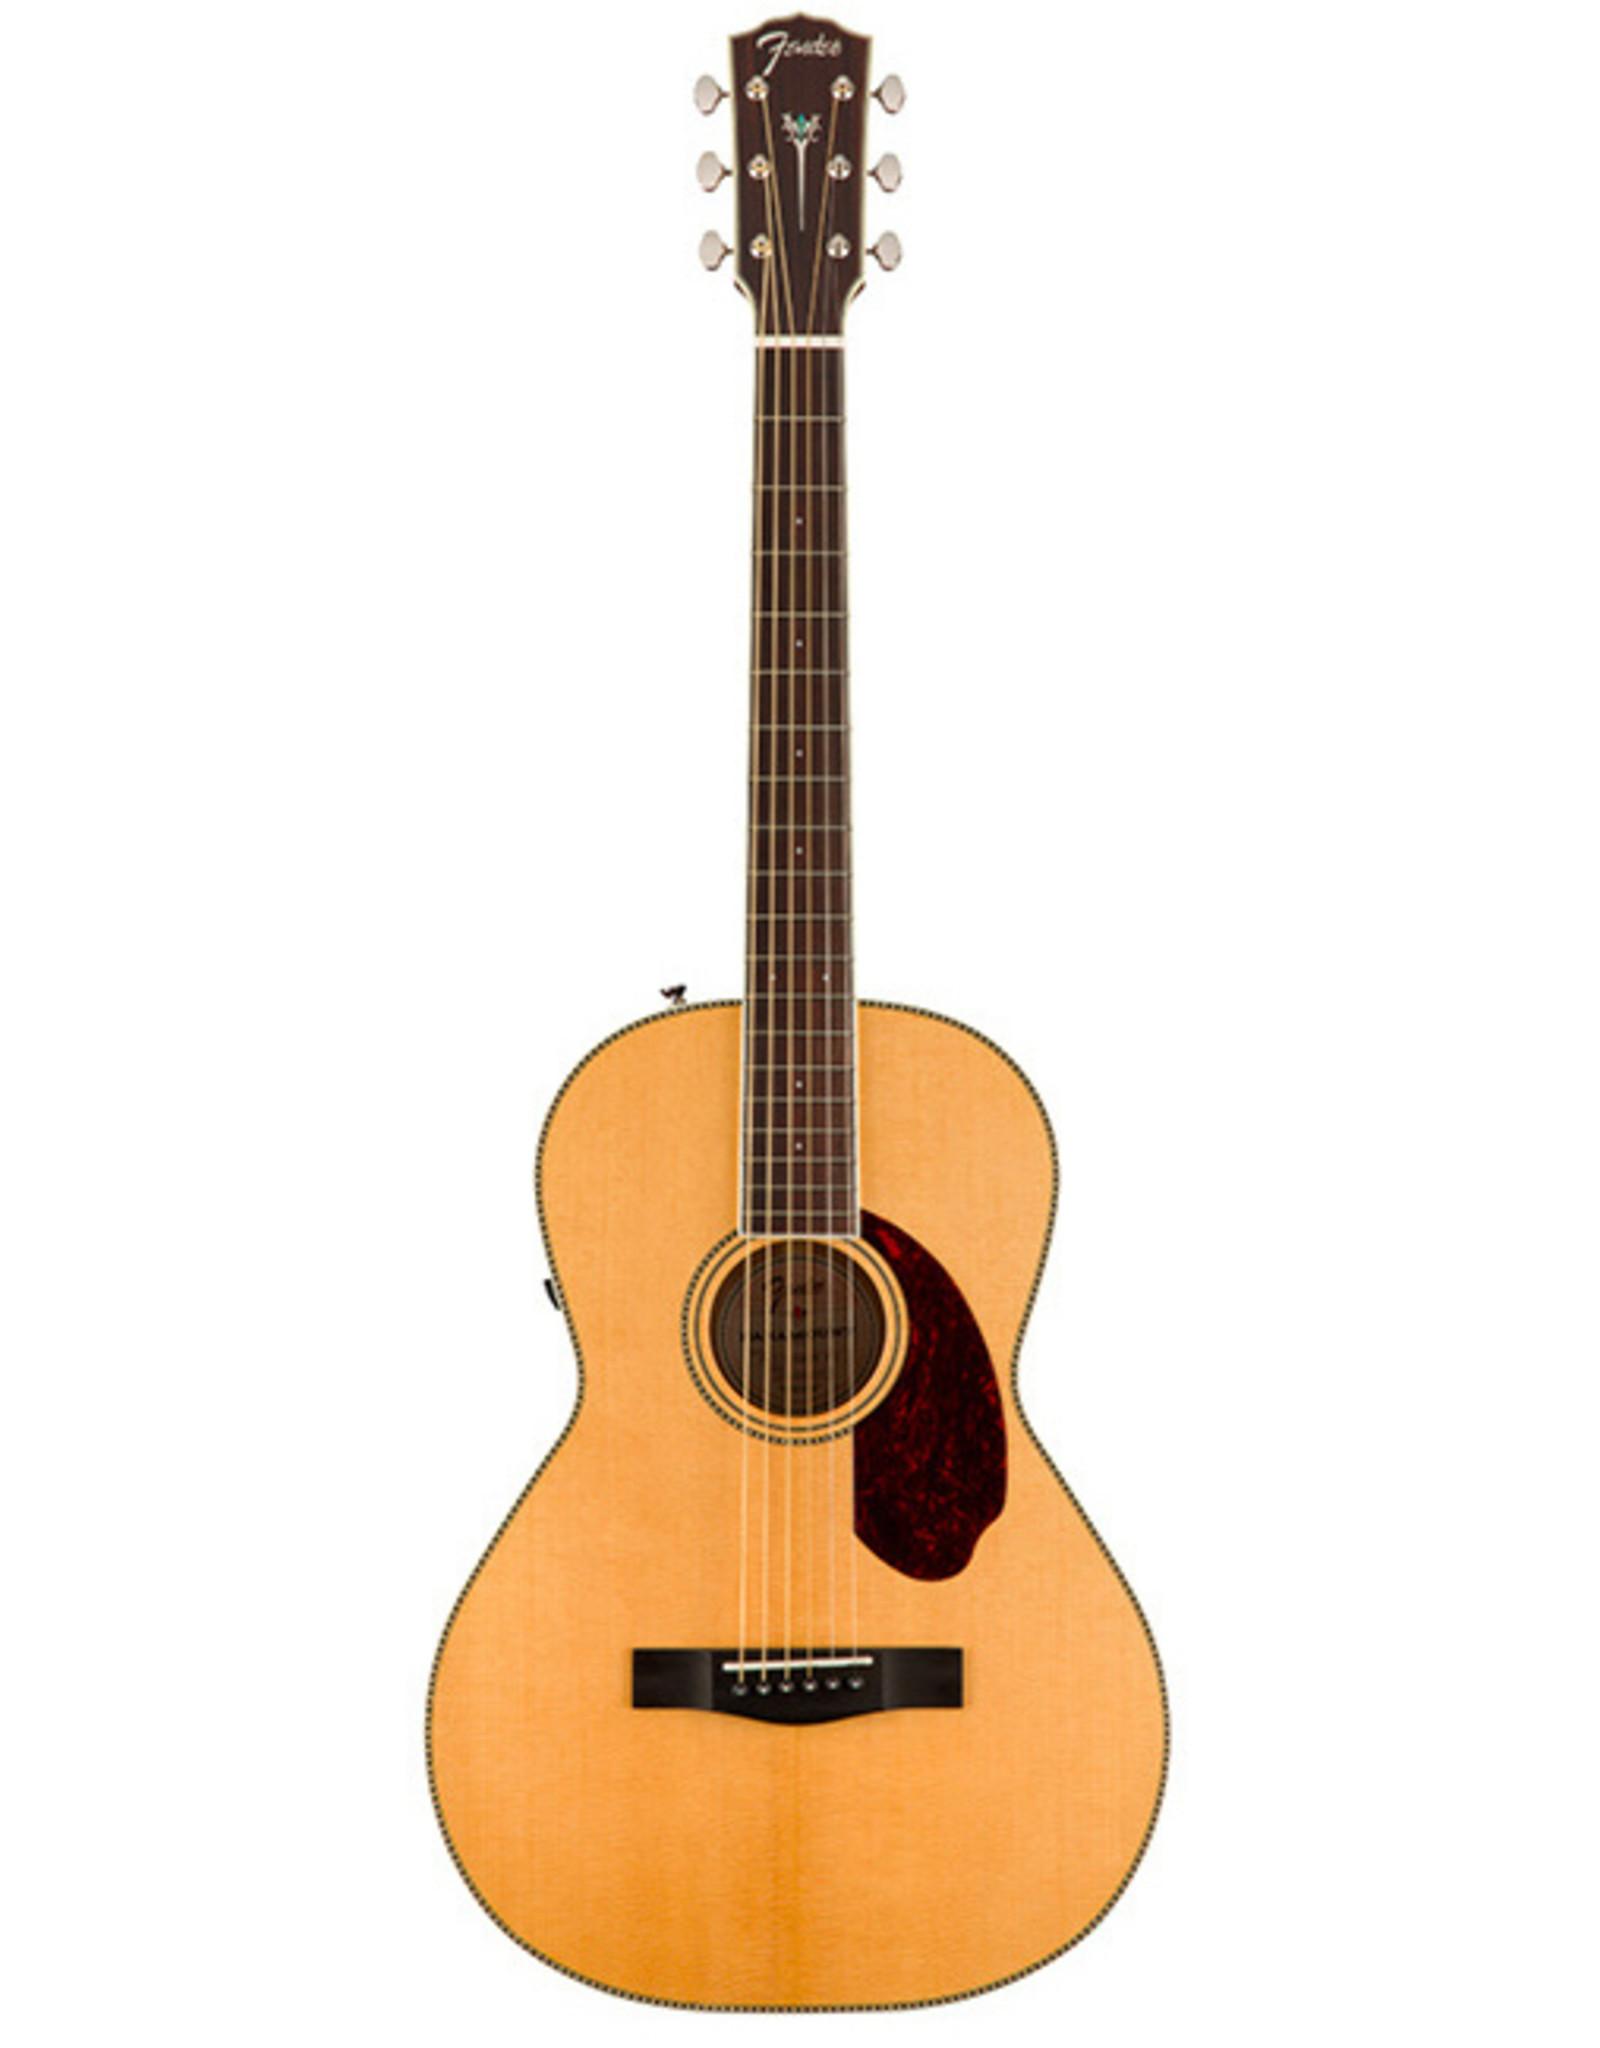 Fender Fender Paramount PM-2 Standard Parlor, Natural w/hsc